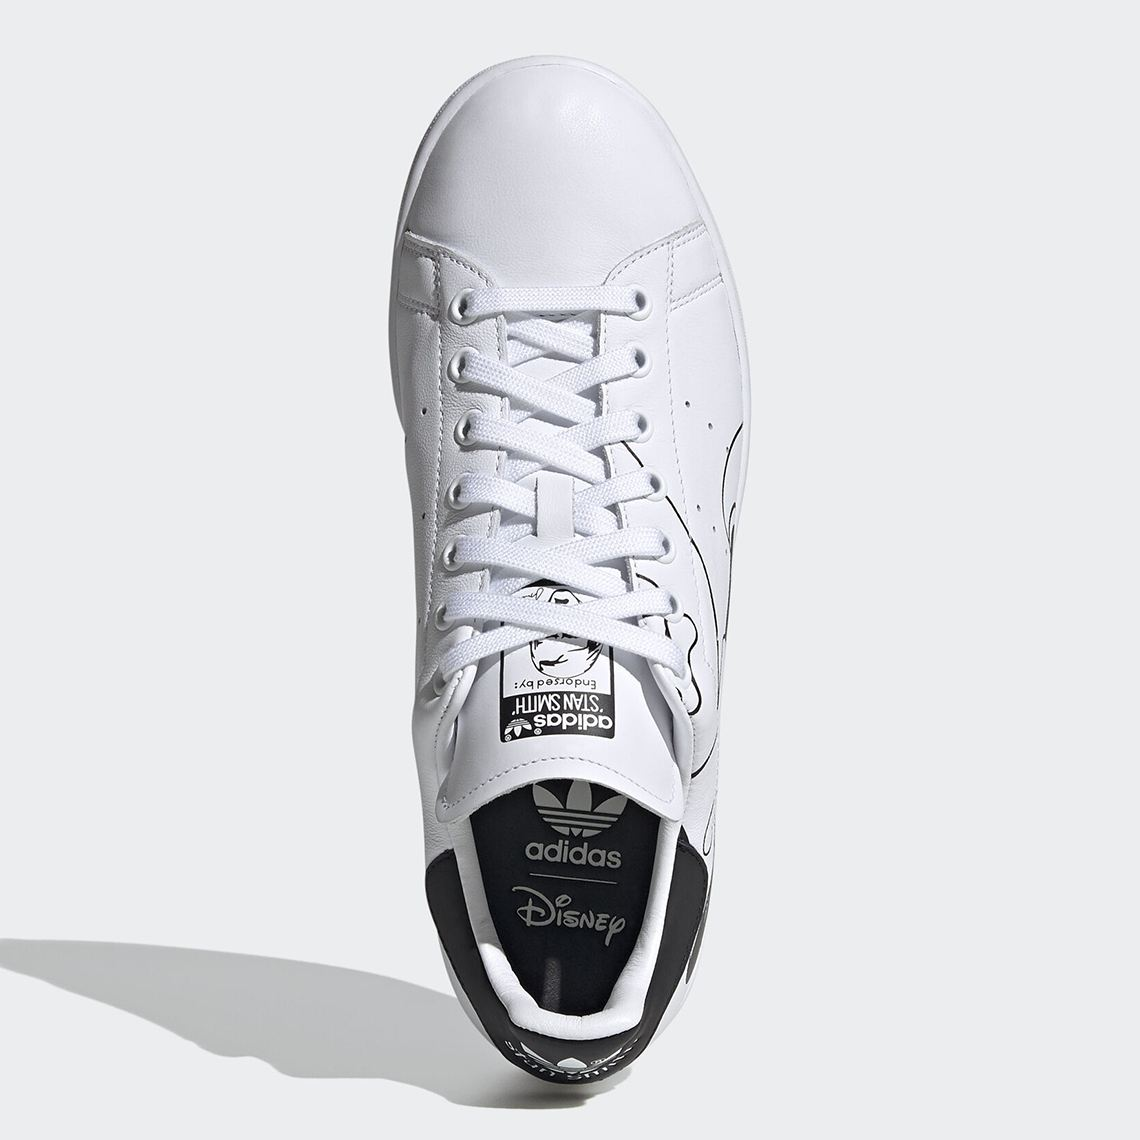 adidas stan smith shoe nike mickey